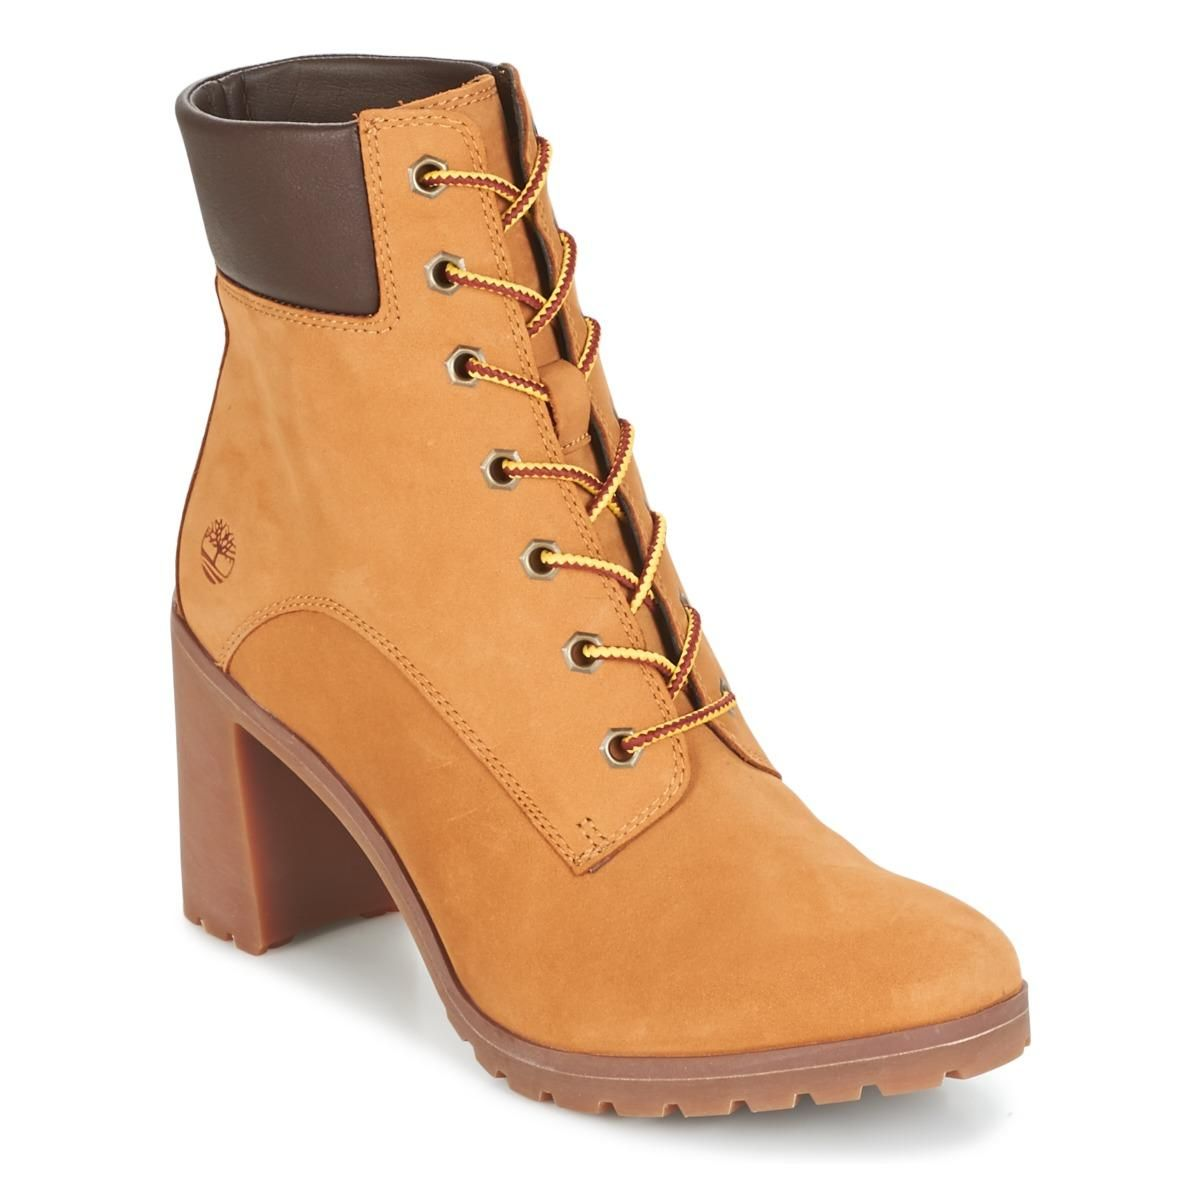 4547f4c6 Brown Women's Glancy 6-inch Heeled Boot - Wheat Nubuck in 2019 ...